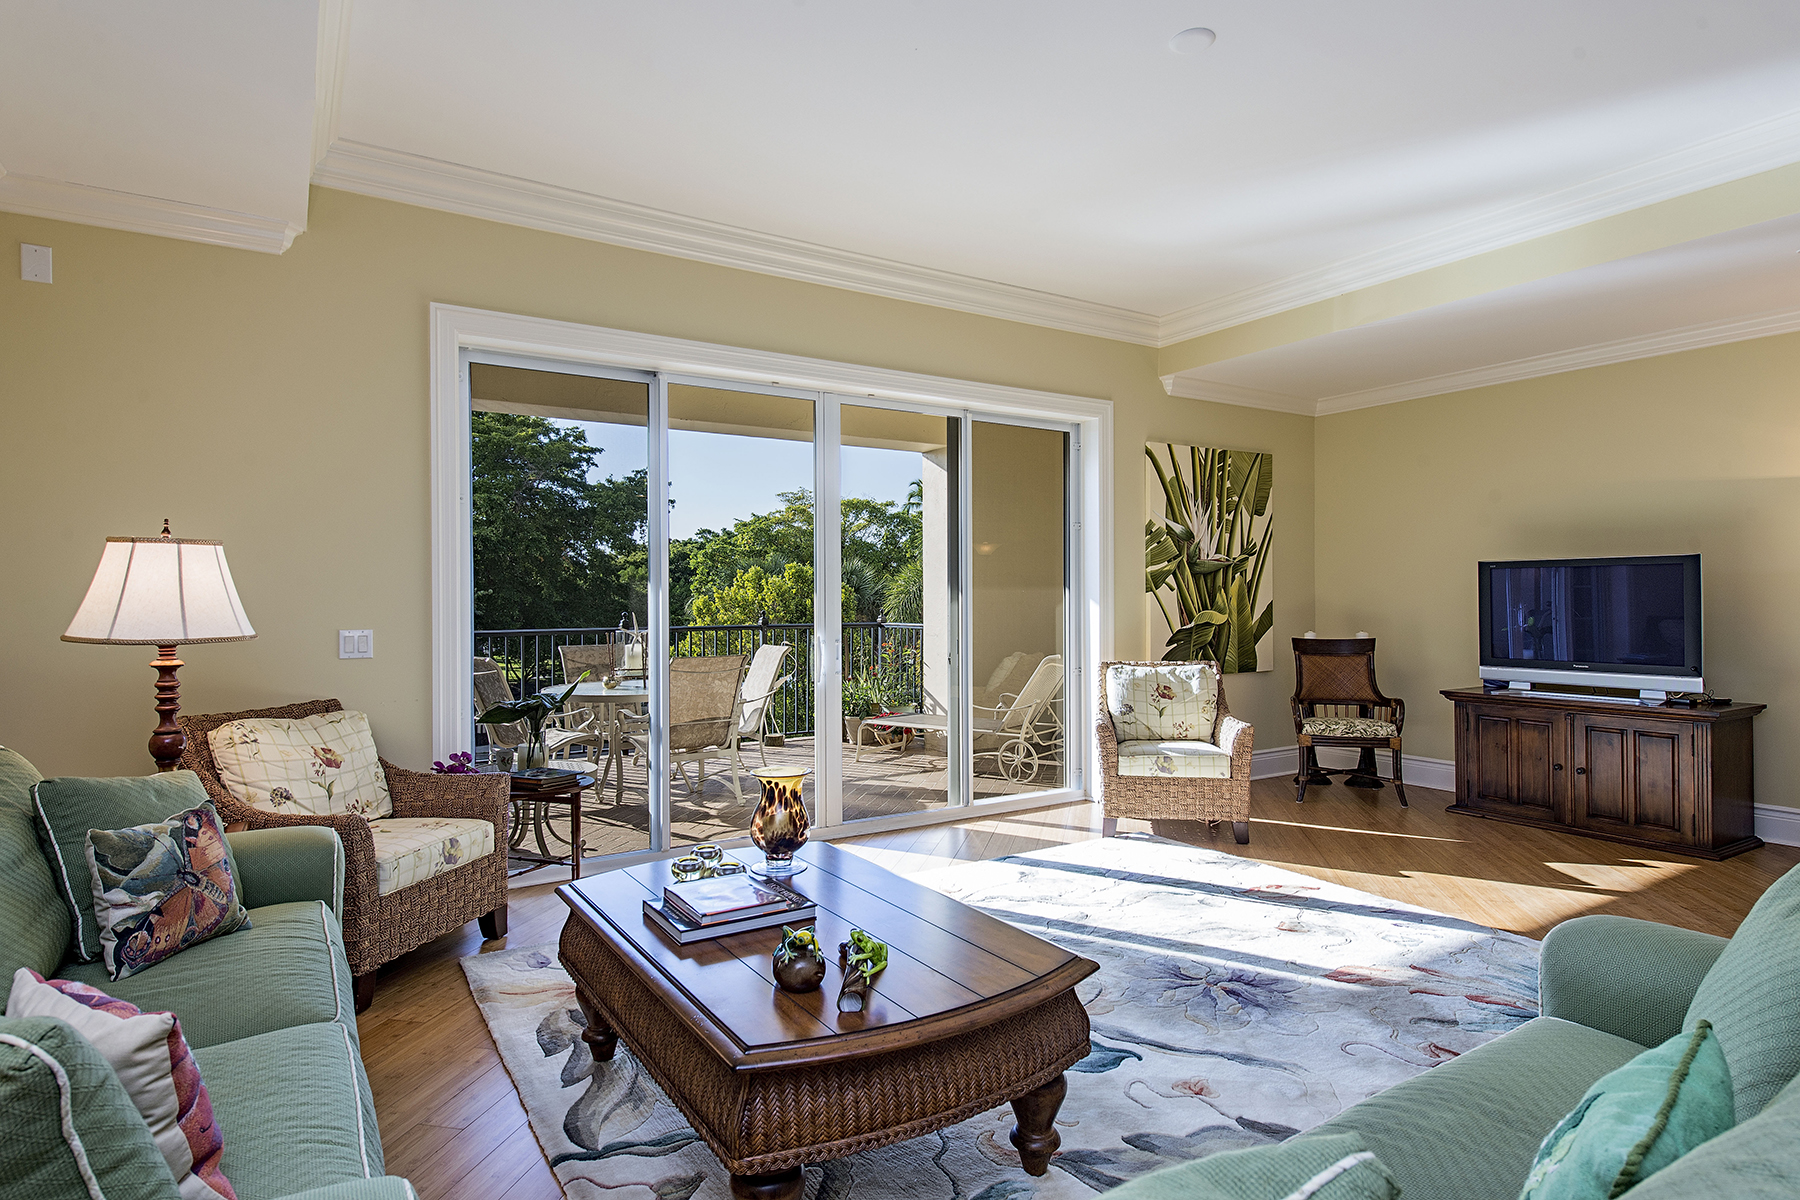 Condomínio para Venda às COQUINA SANDS - CHARLESTON SQUARE 1400 Gulf Shore Blvd N 205 Naples, Florida 34102 Estados Unidos